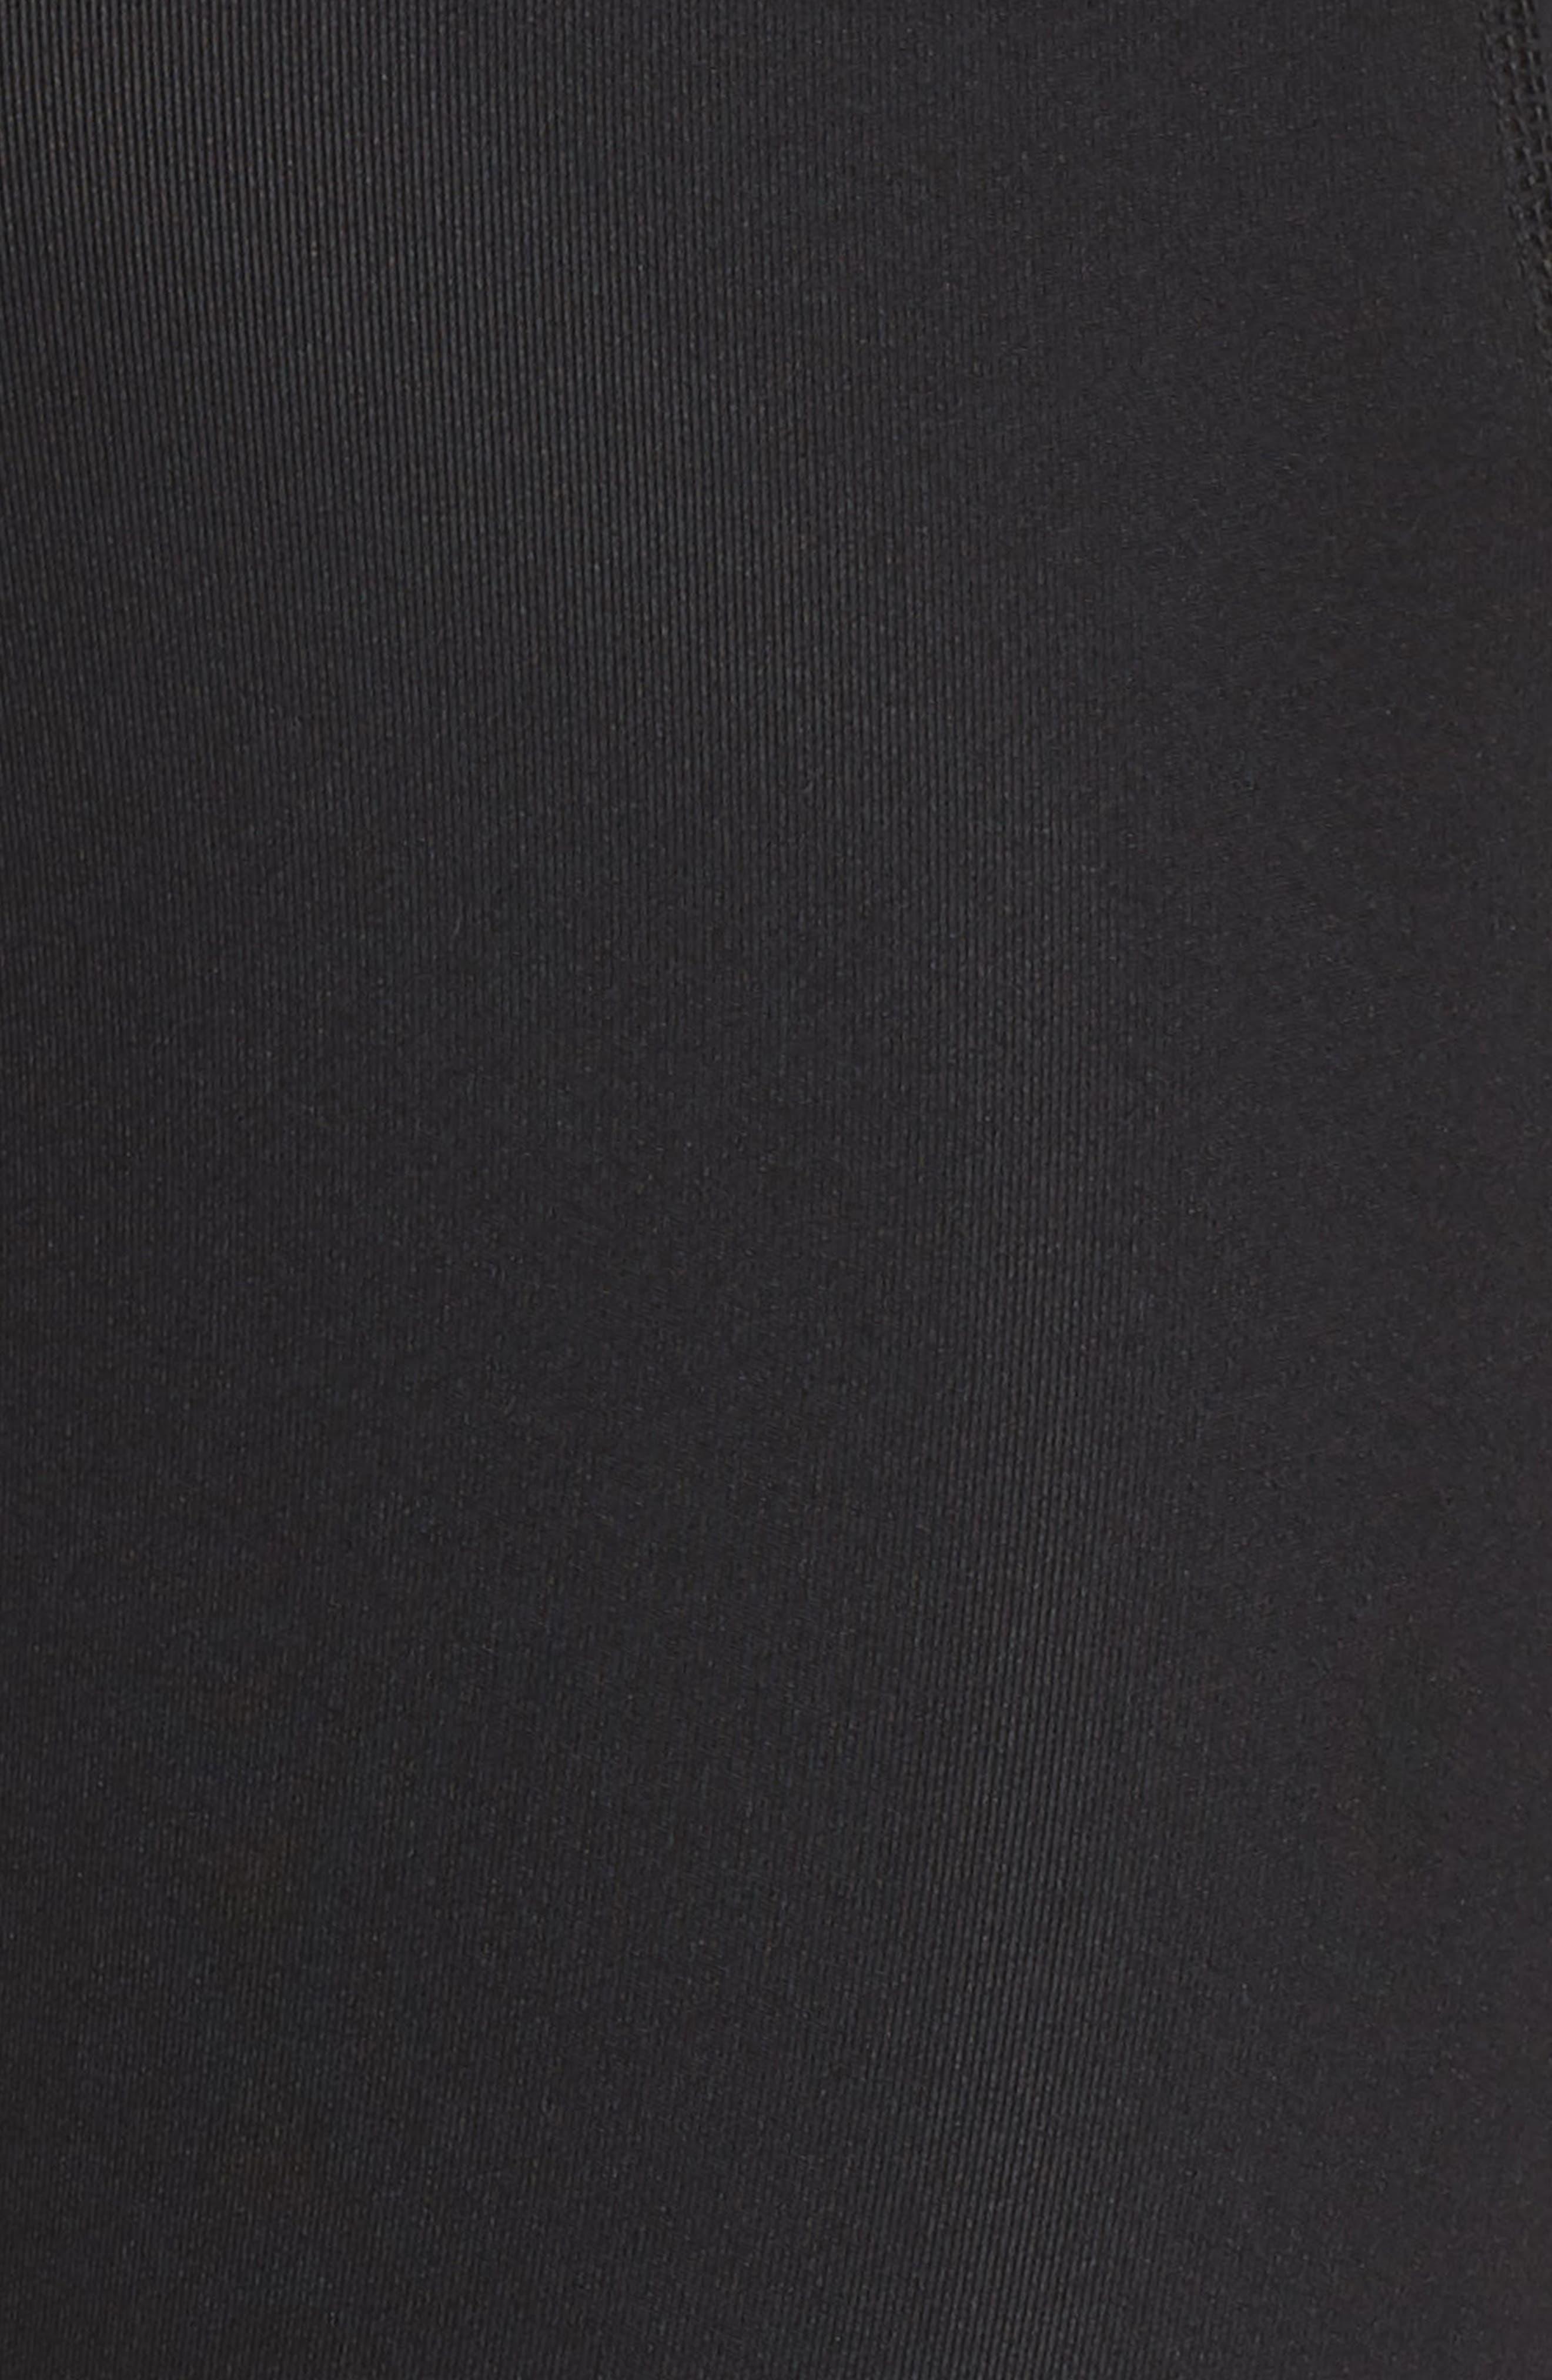 High Waist Run Sprint In Crop Leggings,                             Alternate thumbnail 6, color,                             BLACK